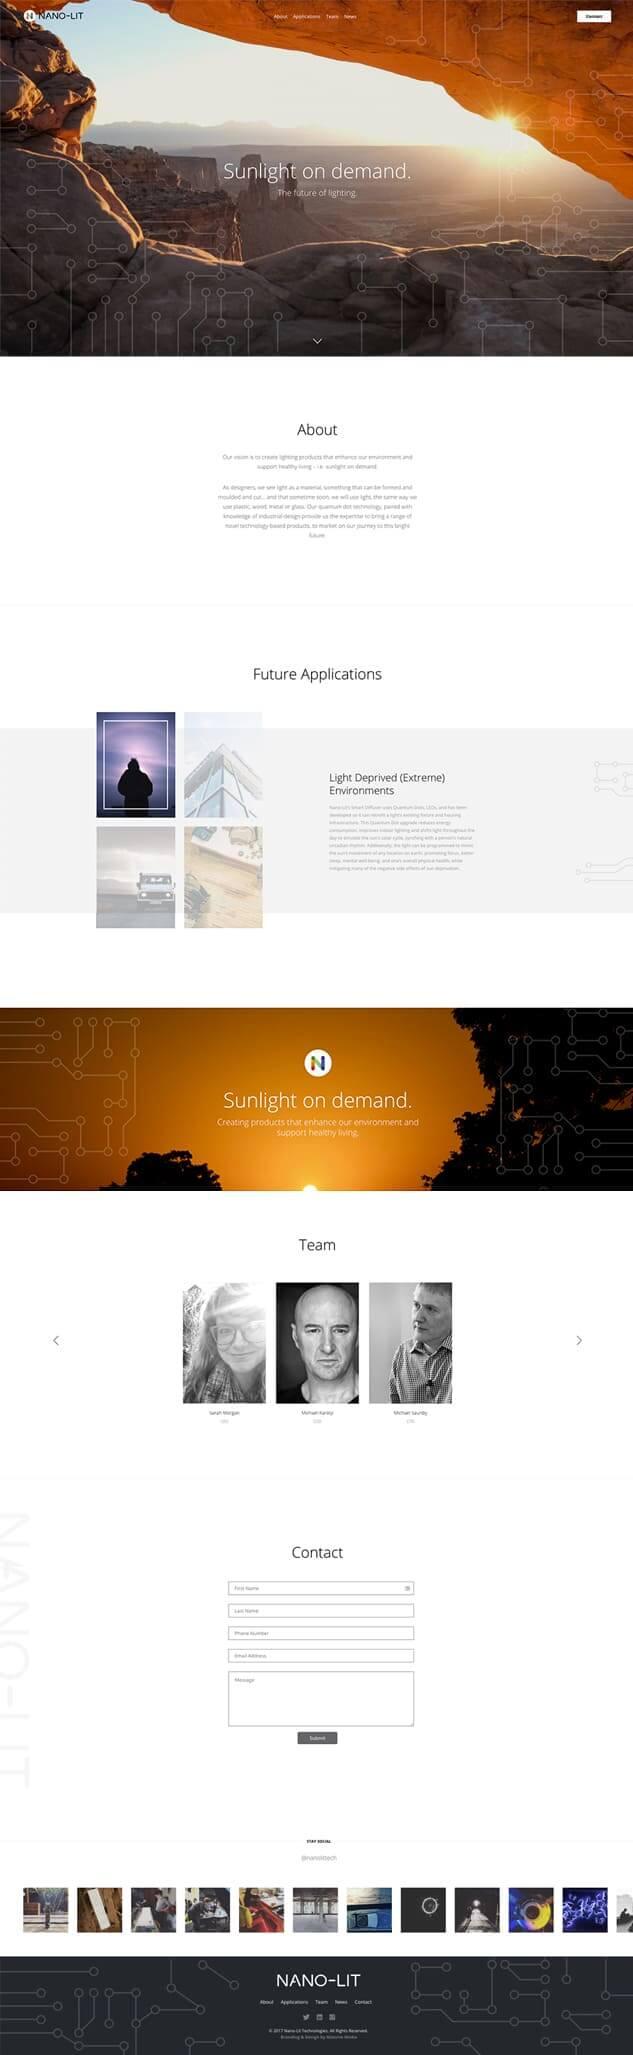 Homepage of Nano-Lit Website